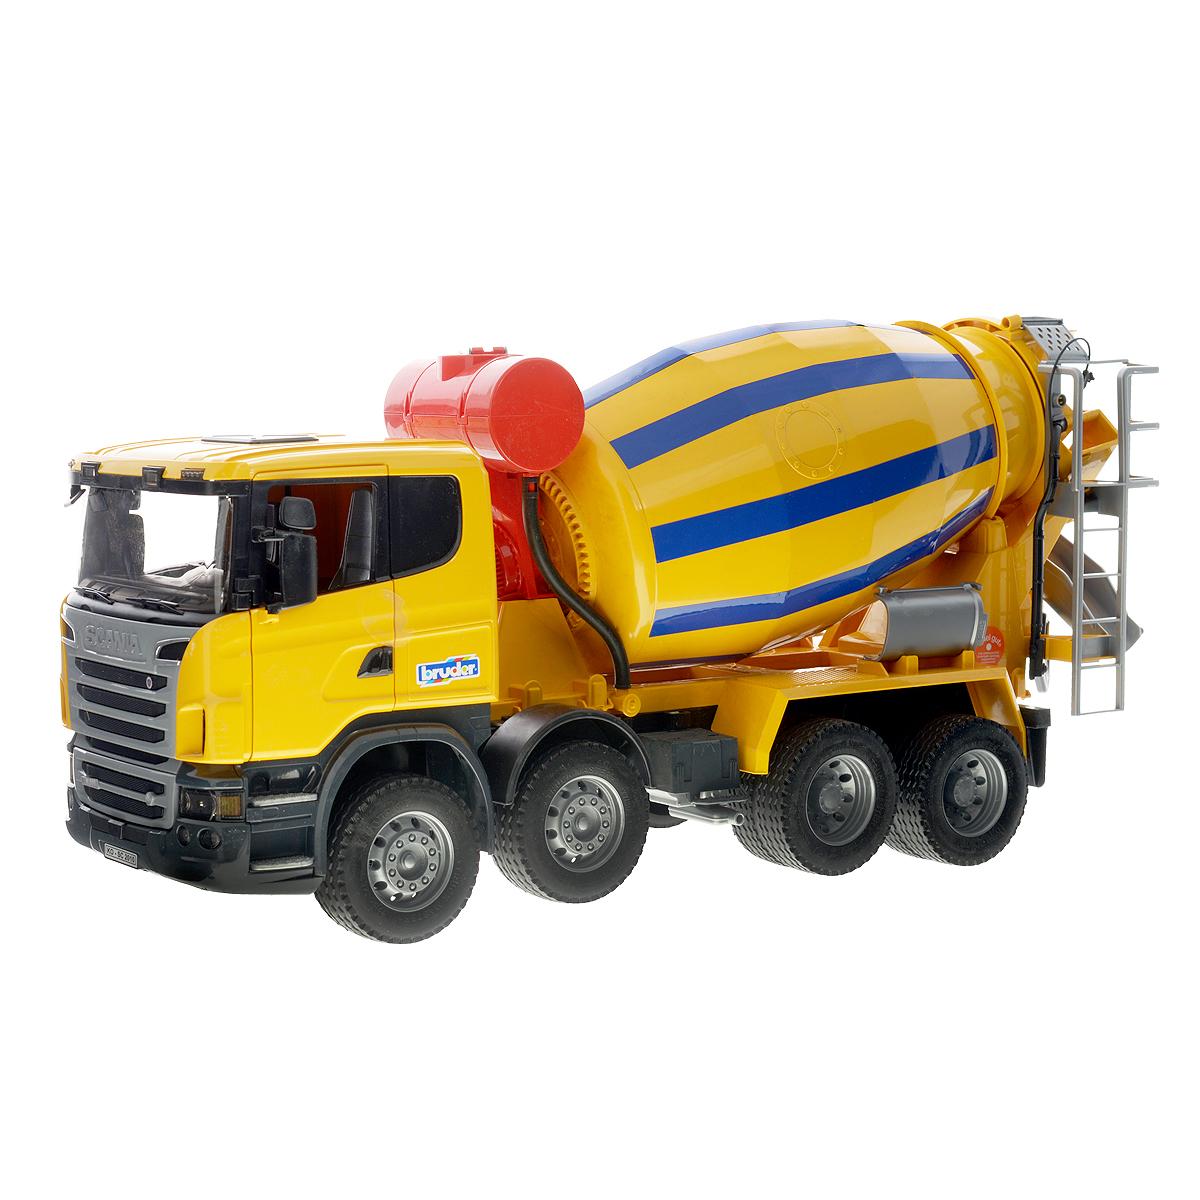 Bruder Бетономешалка Scania, цвет: желтый, синий bruder пожарная машина scania с 3 лет